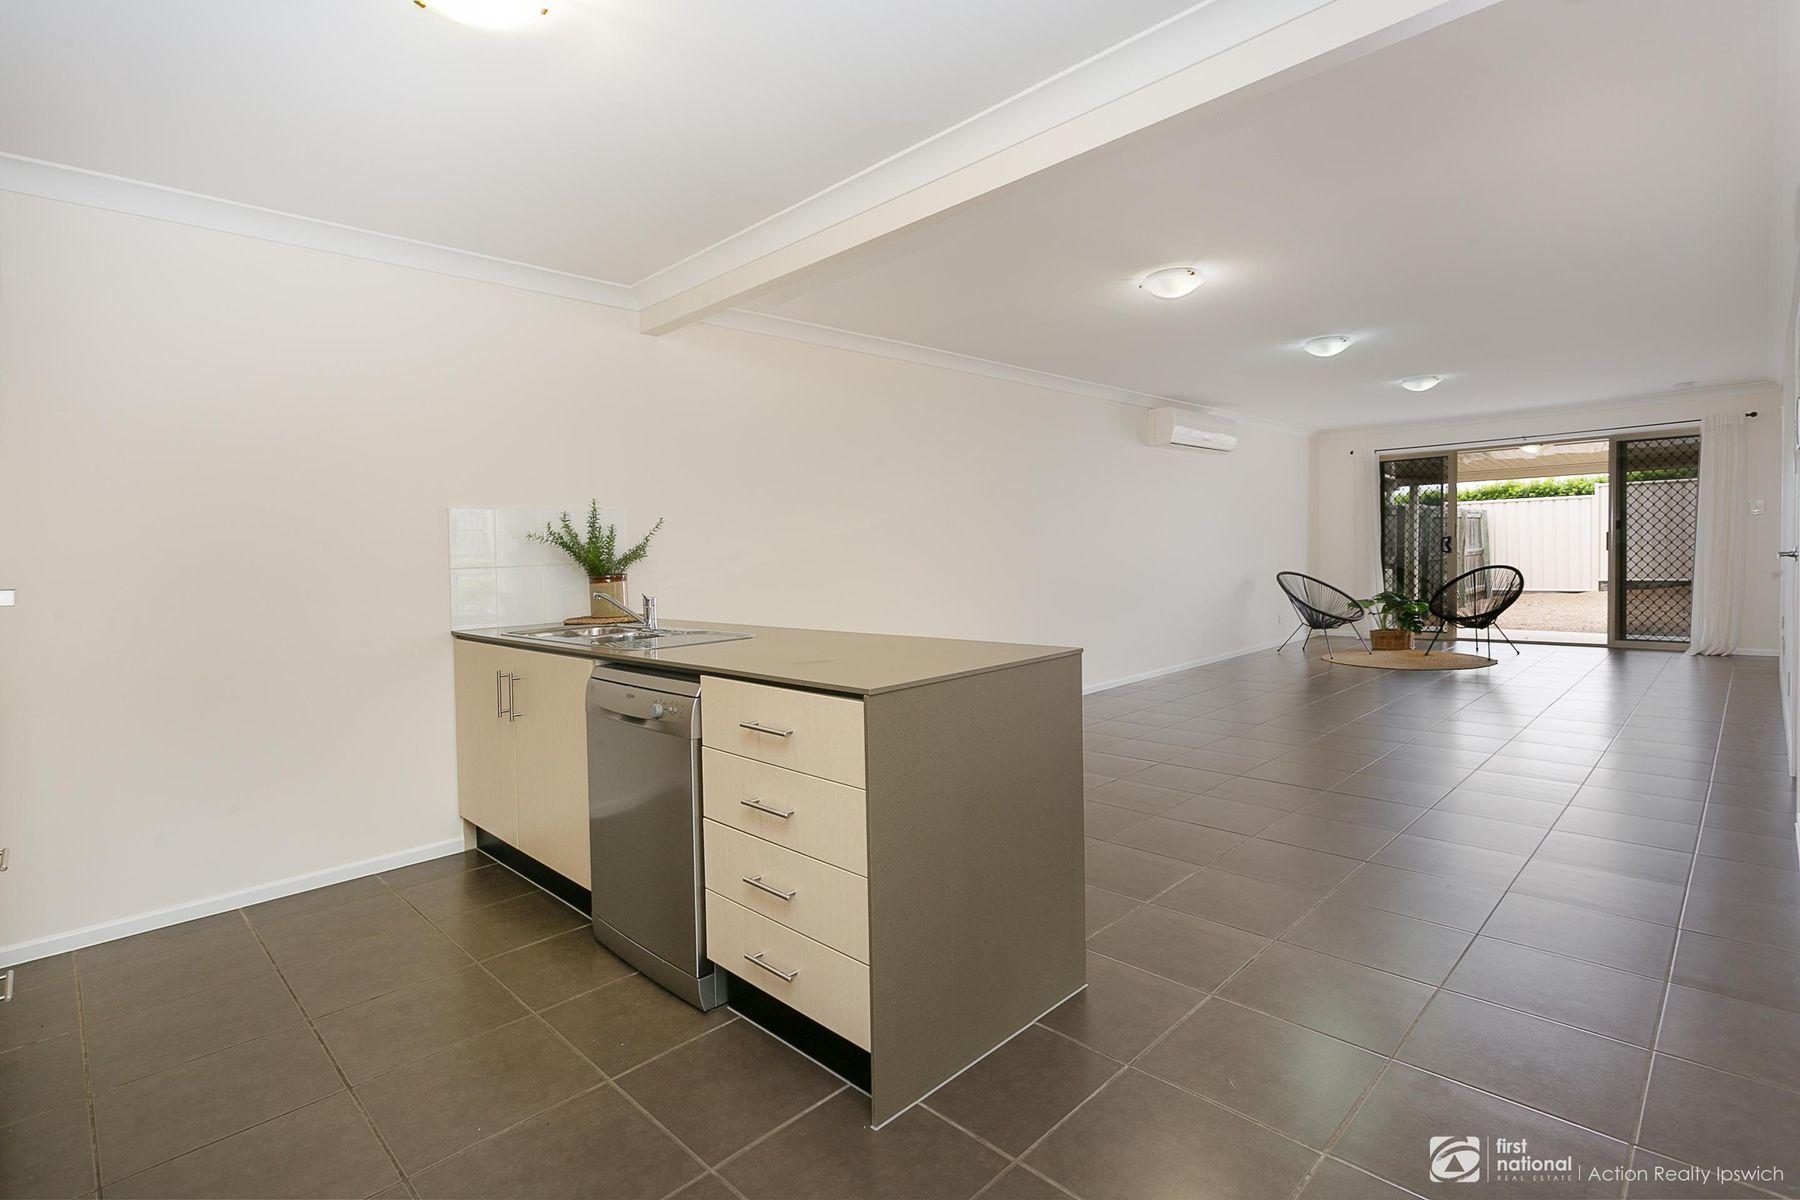 2/12 Lexington Street, Flinders View, QLD 4305